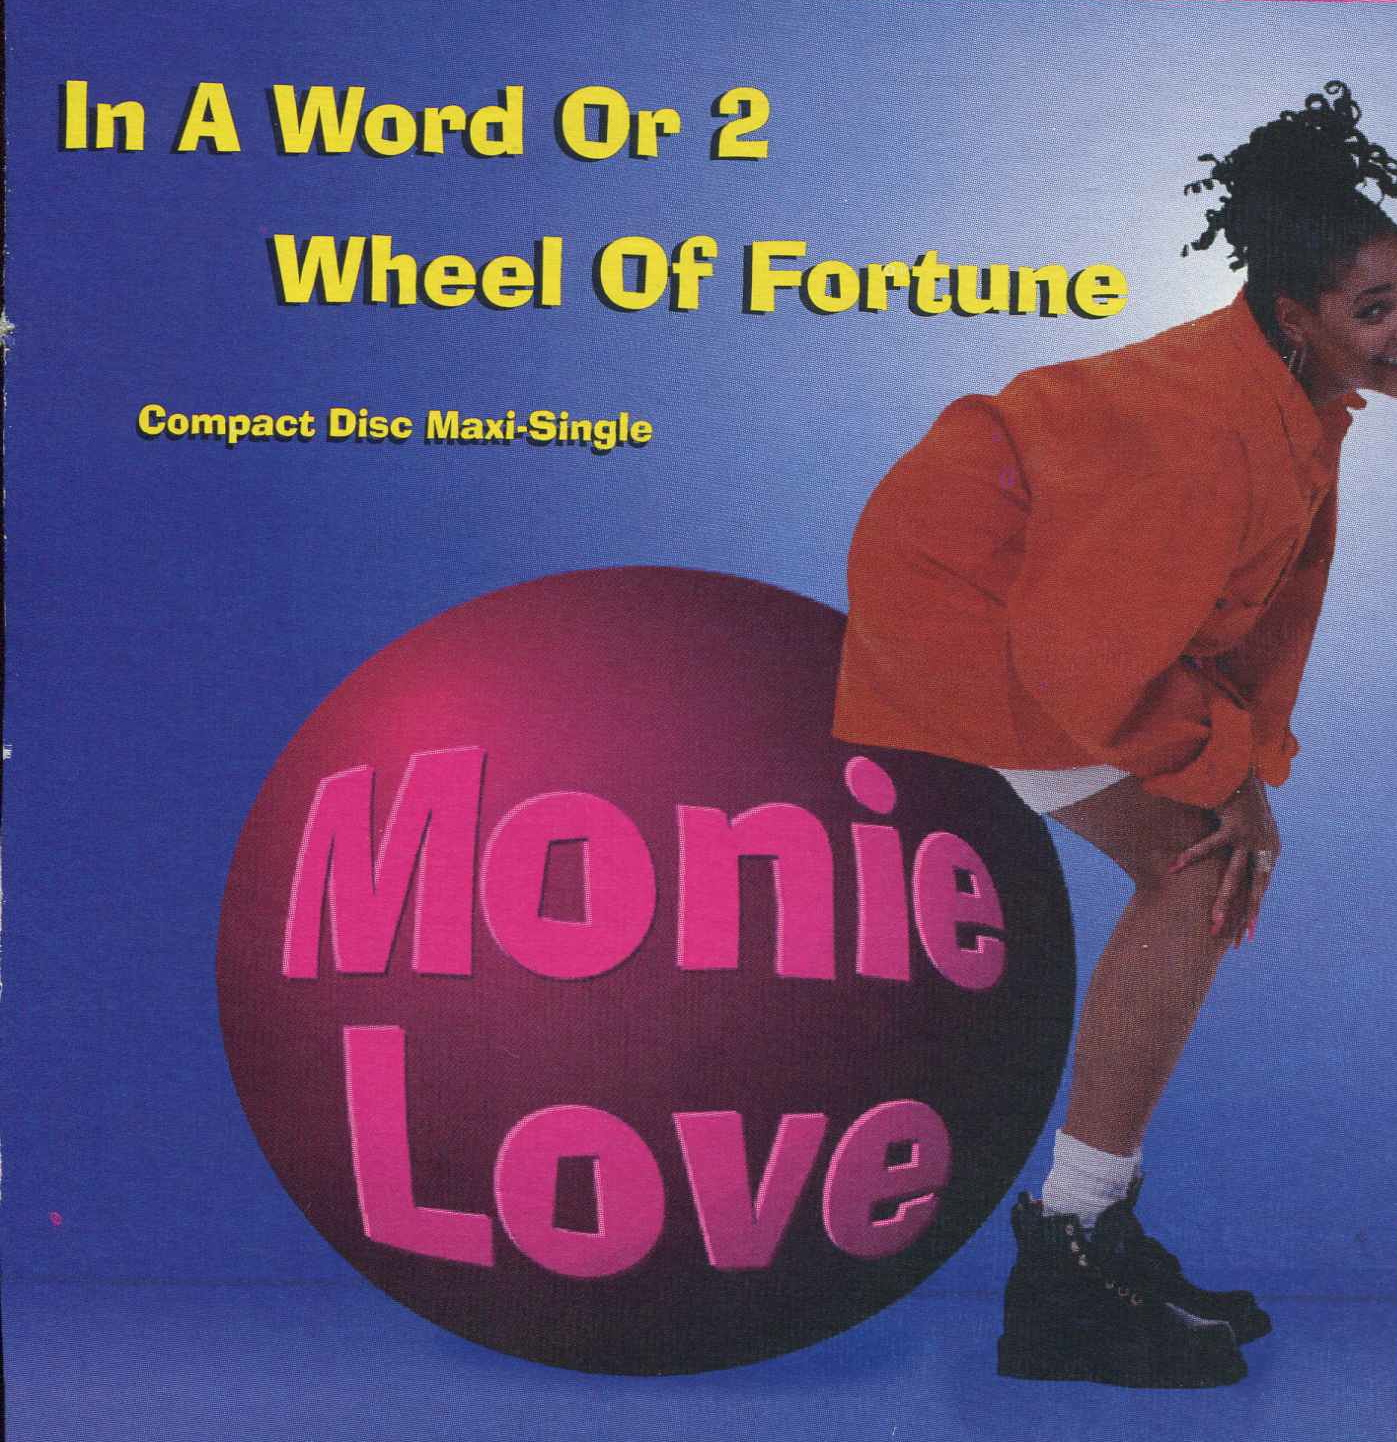 http://3.bp.blogspot.com/-zYynlh4fpLA/TWFXCv29OlI/AAAAAAAAAkA/M0BQ__mL4E8/s1600/Monie+LoveWheFR.jpg